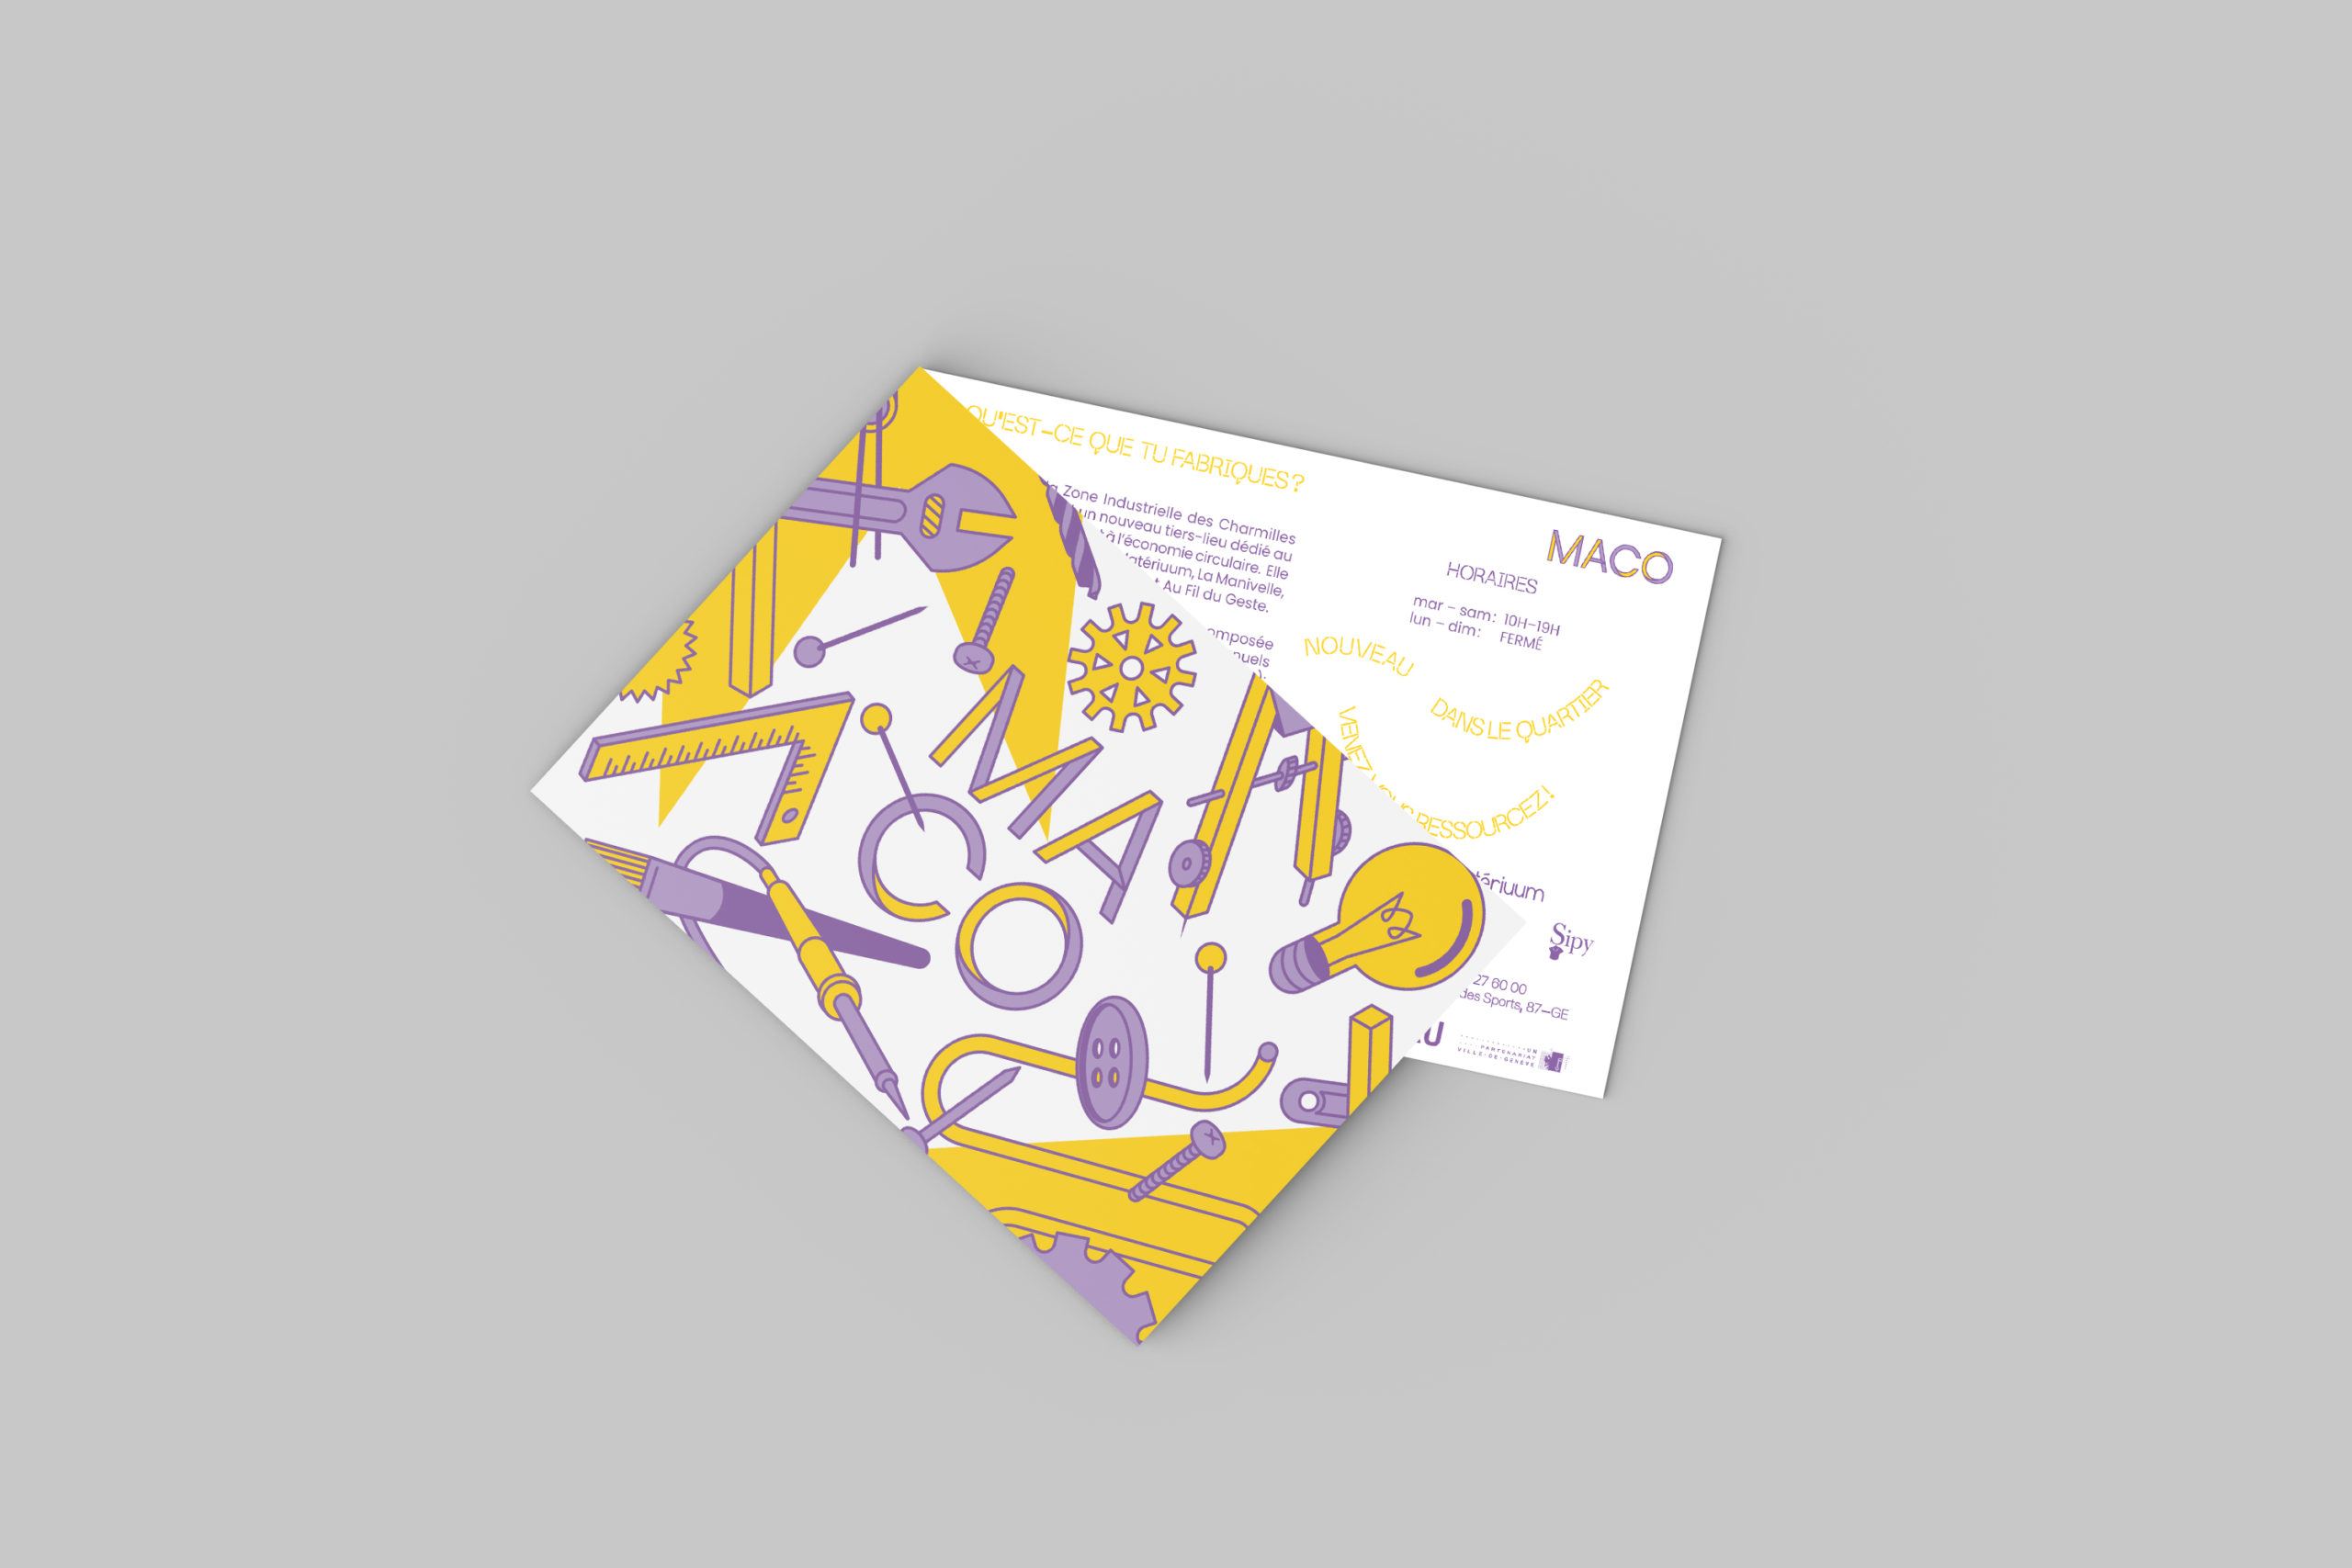 MACO_Flyer